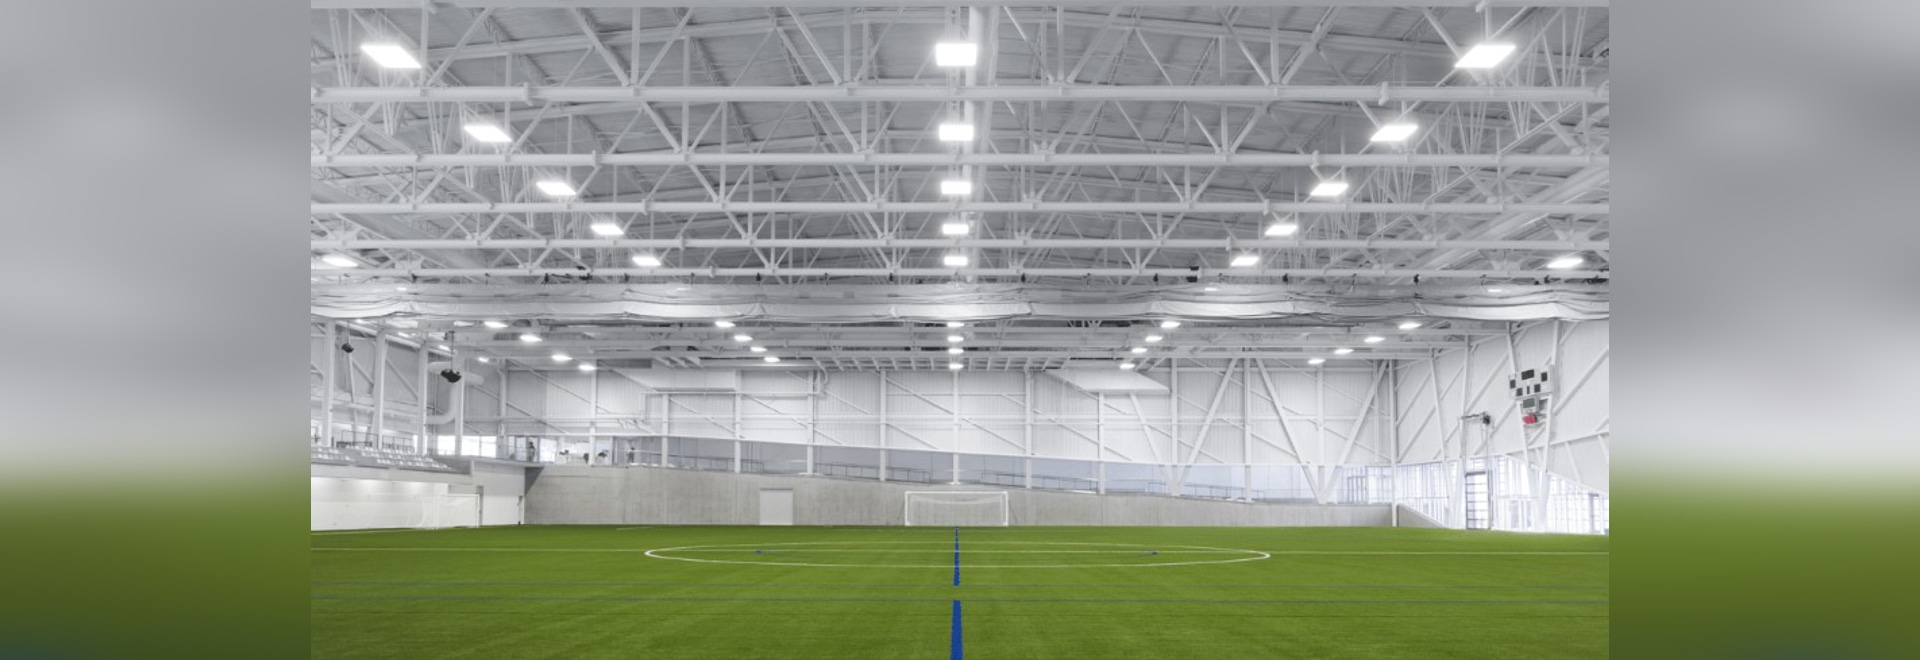 CCM2 + CLC Architects, Complexe sportif Marc‐Simoneau, soccer field. Photo: Dave Tremblay